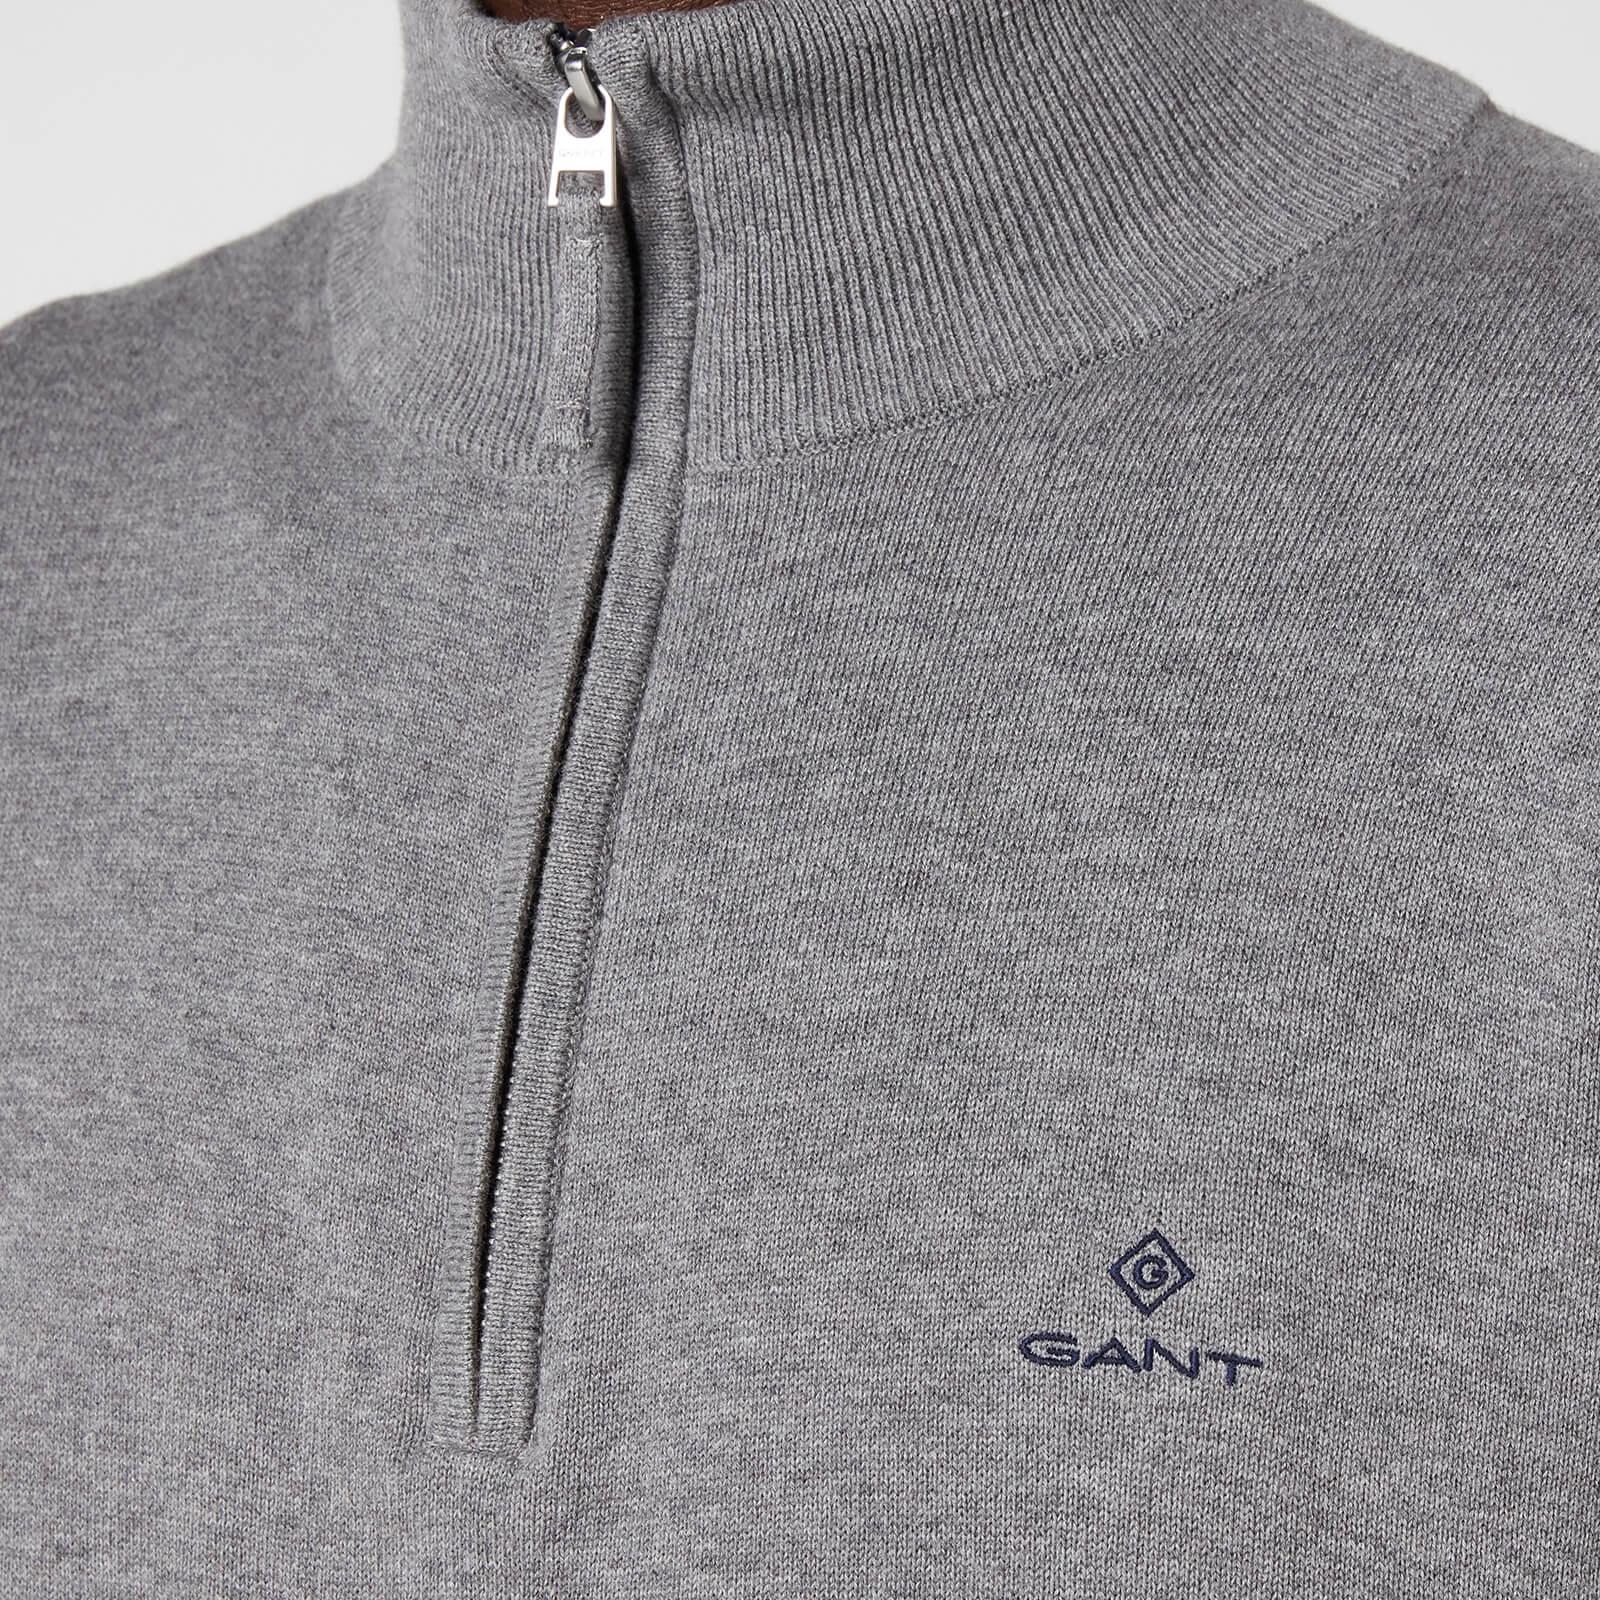 Gant Men's Classic Cotton Half Zip Jumper - Dark Grey Melange - Xxl 8030545092 General Clothing, Grey